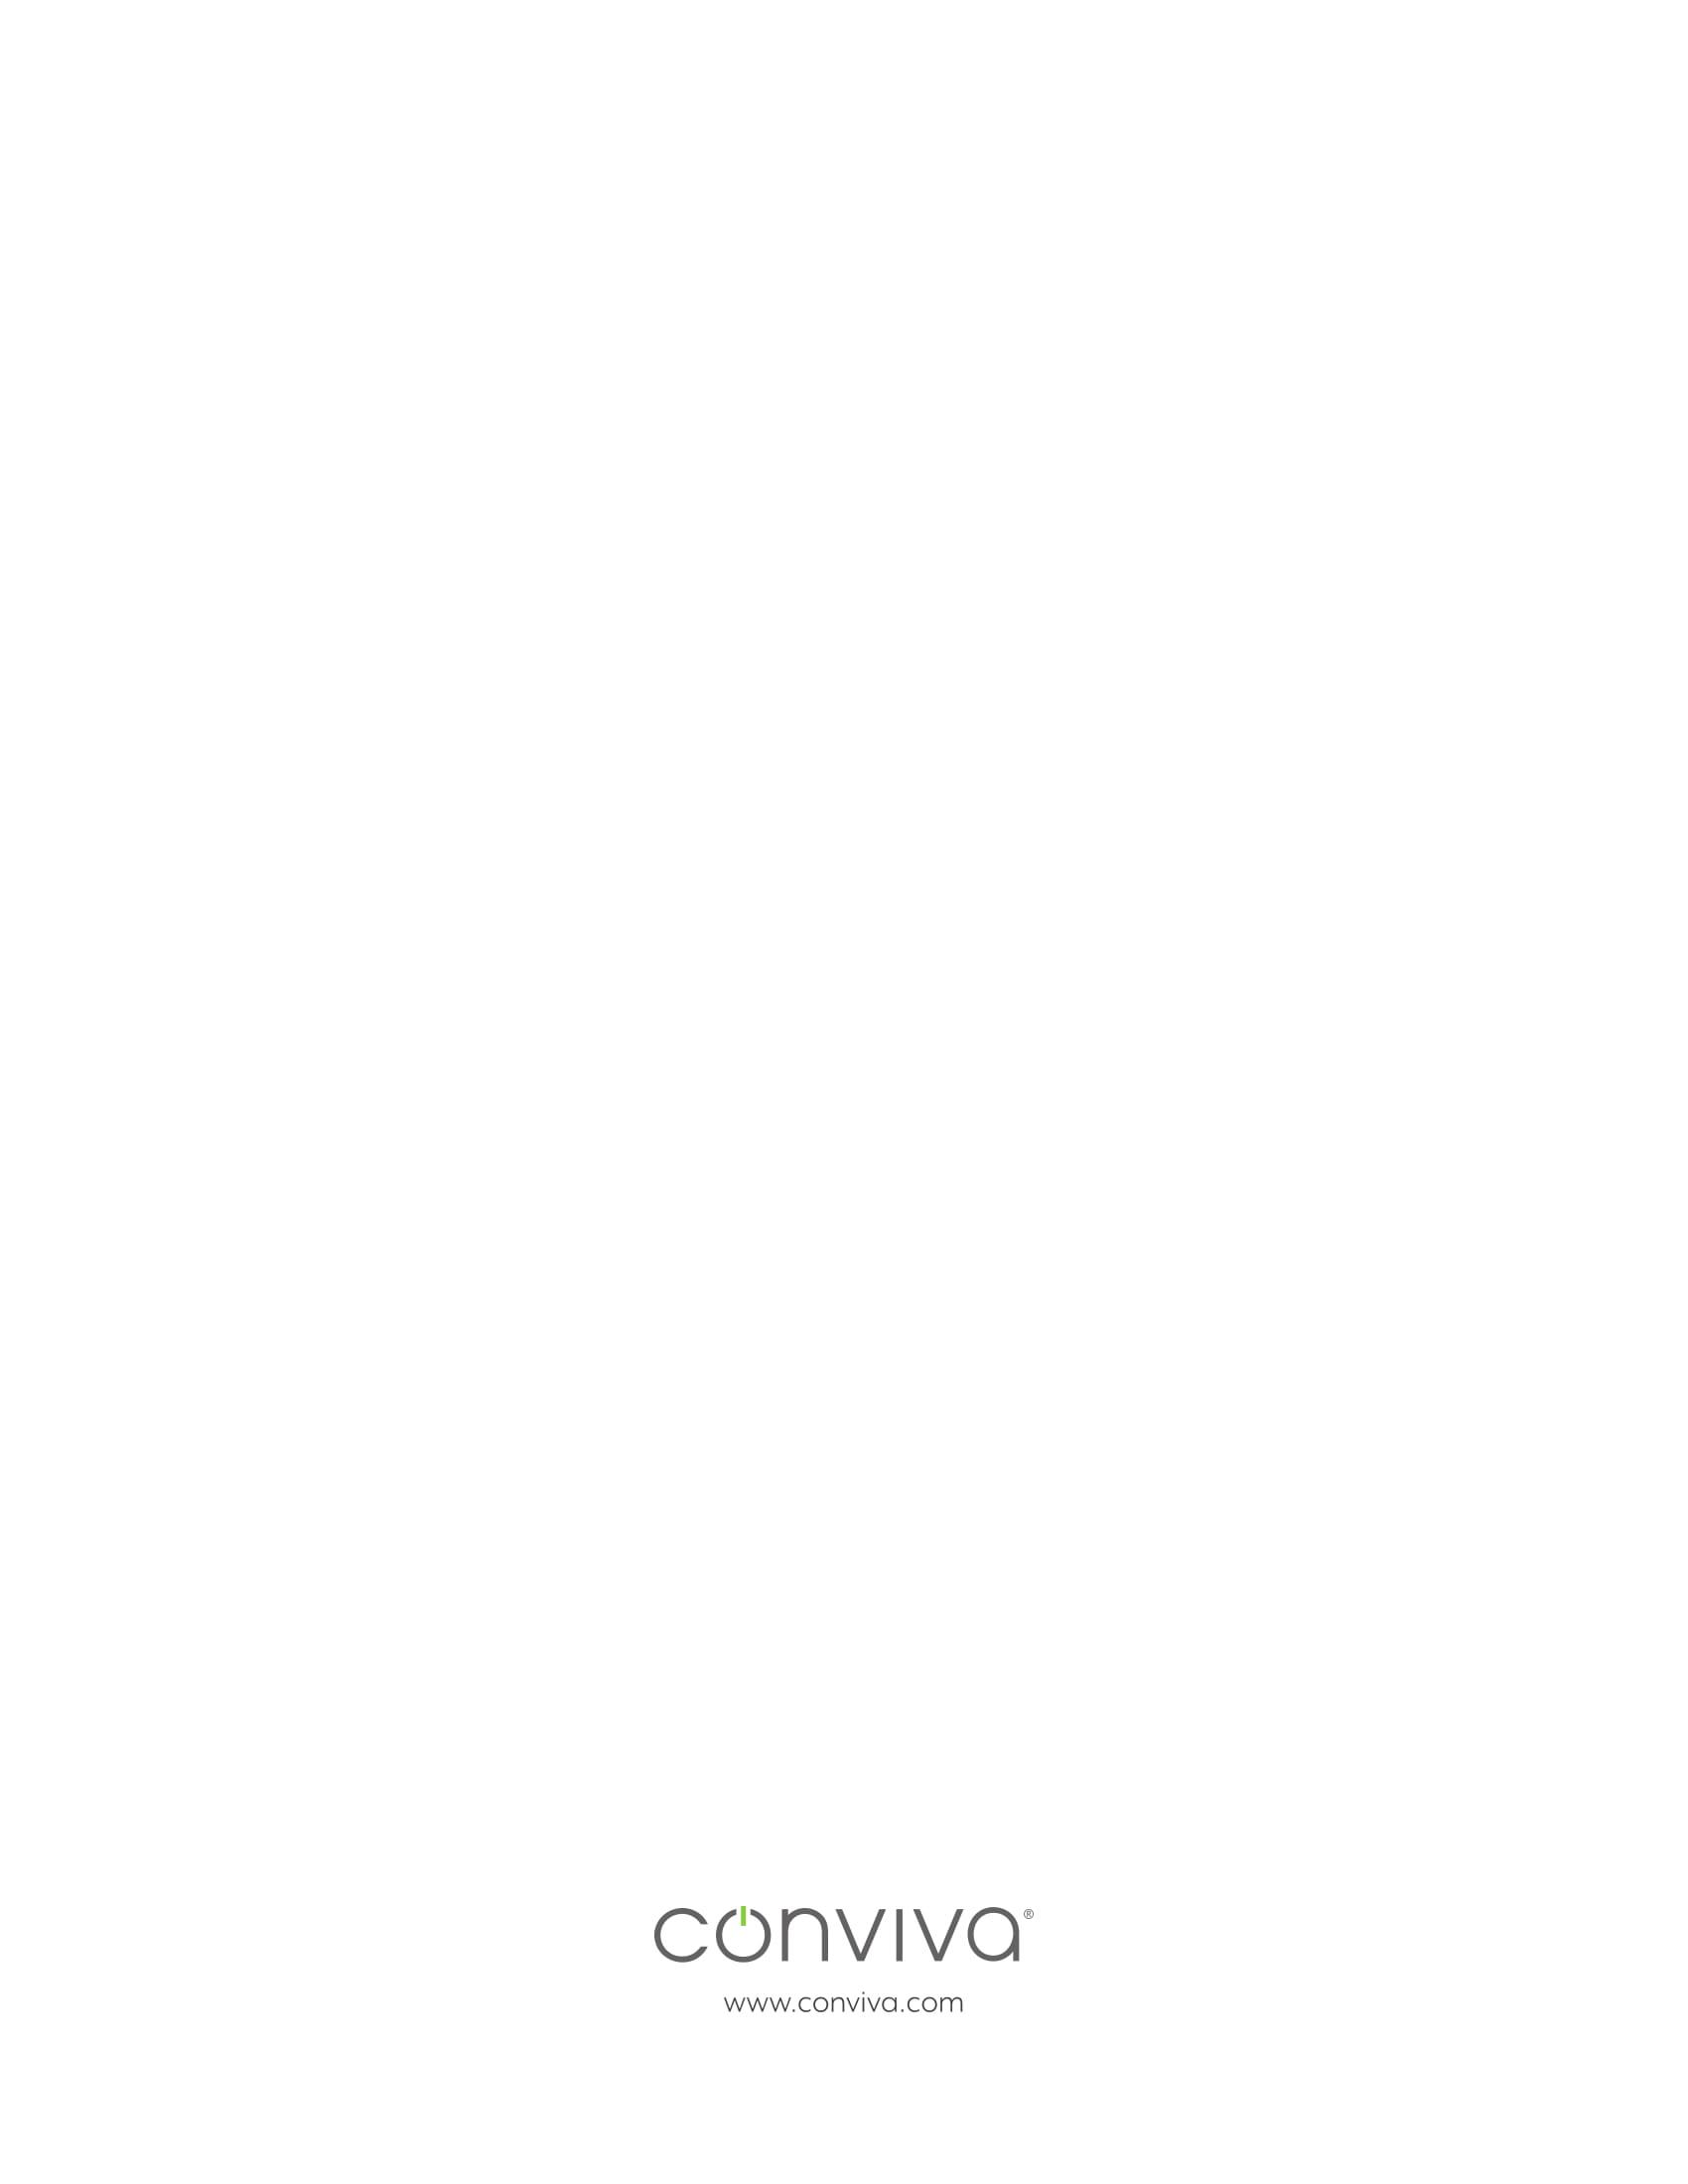 Conviva:2019年Q1电视流媒体行业报告